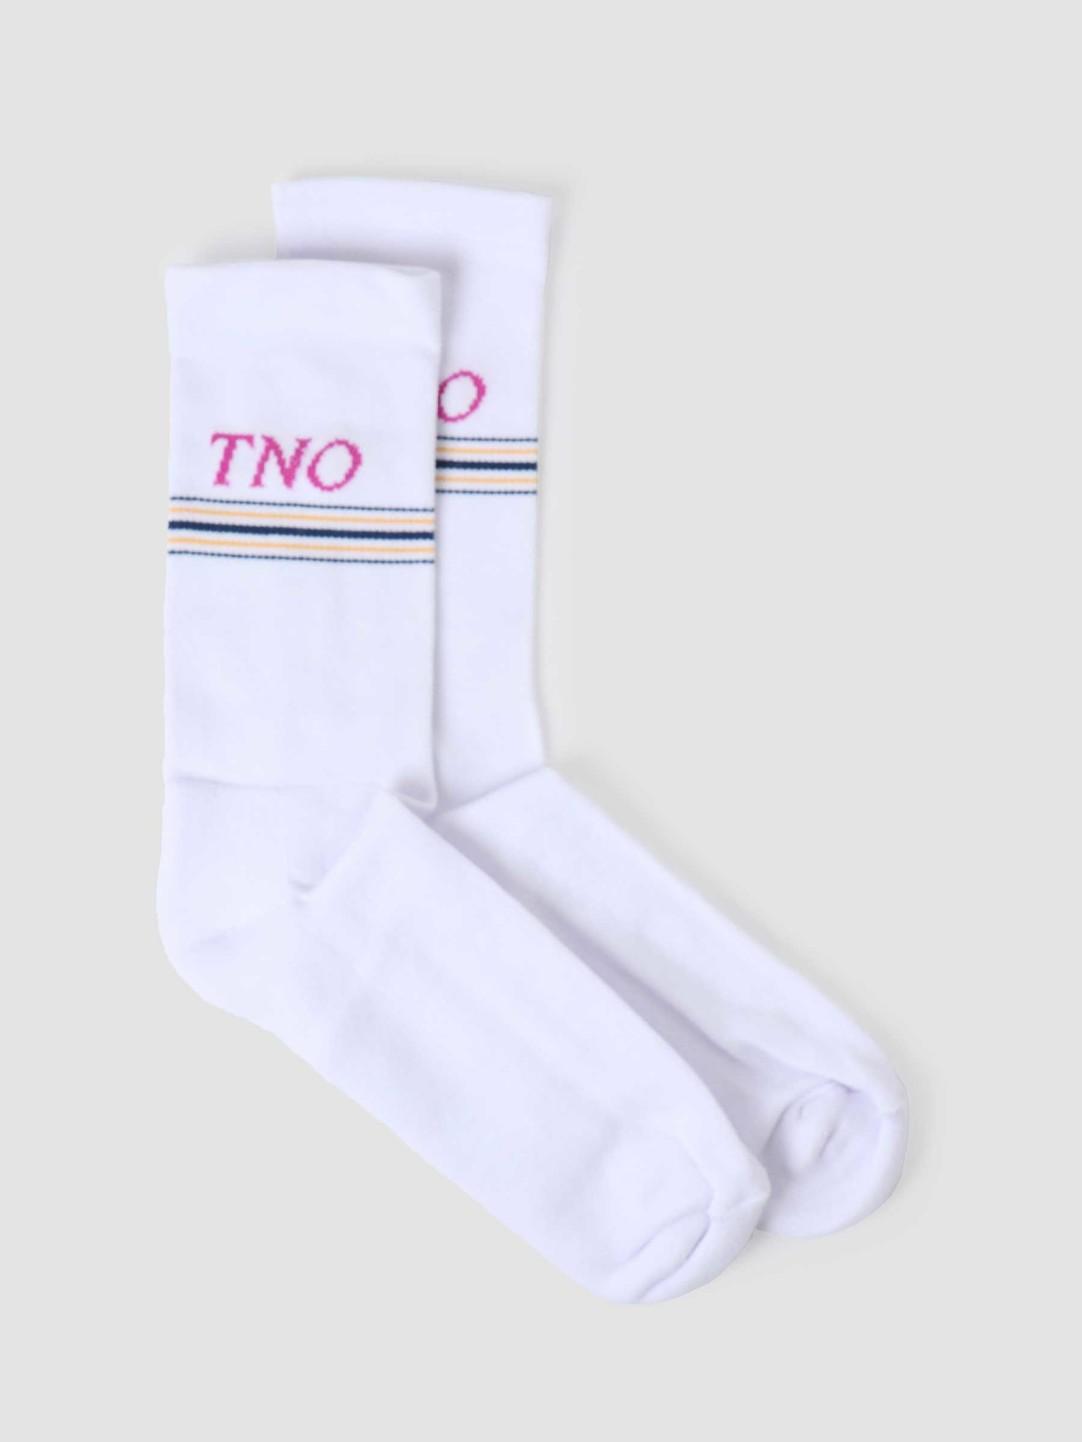 The New Originals The New Originals Tno Underline Socks White